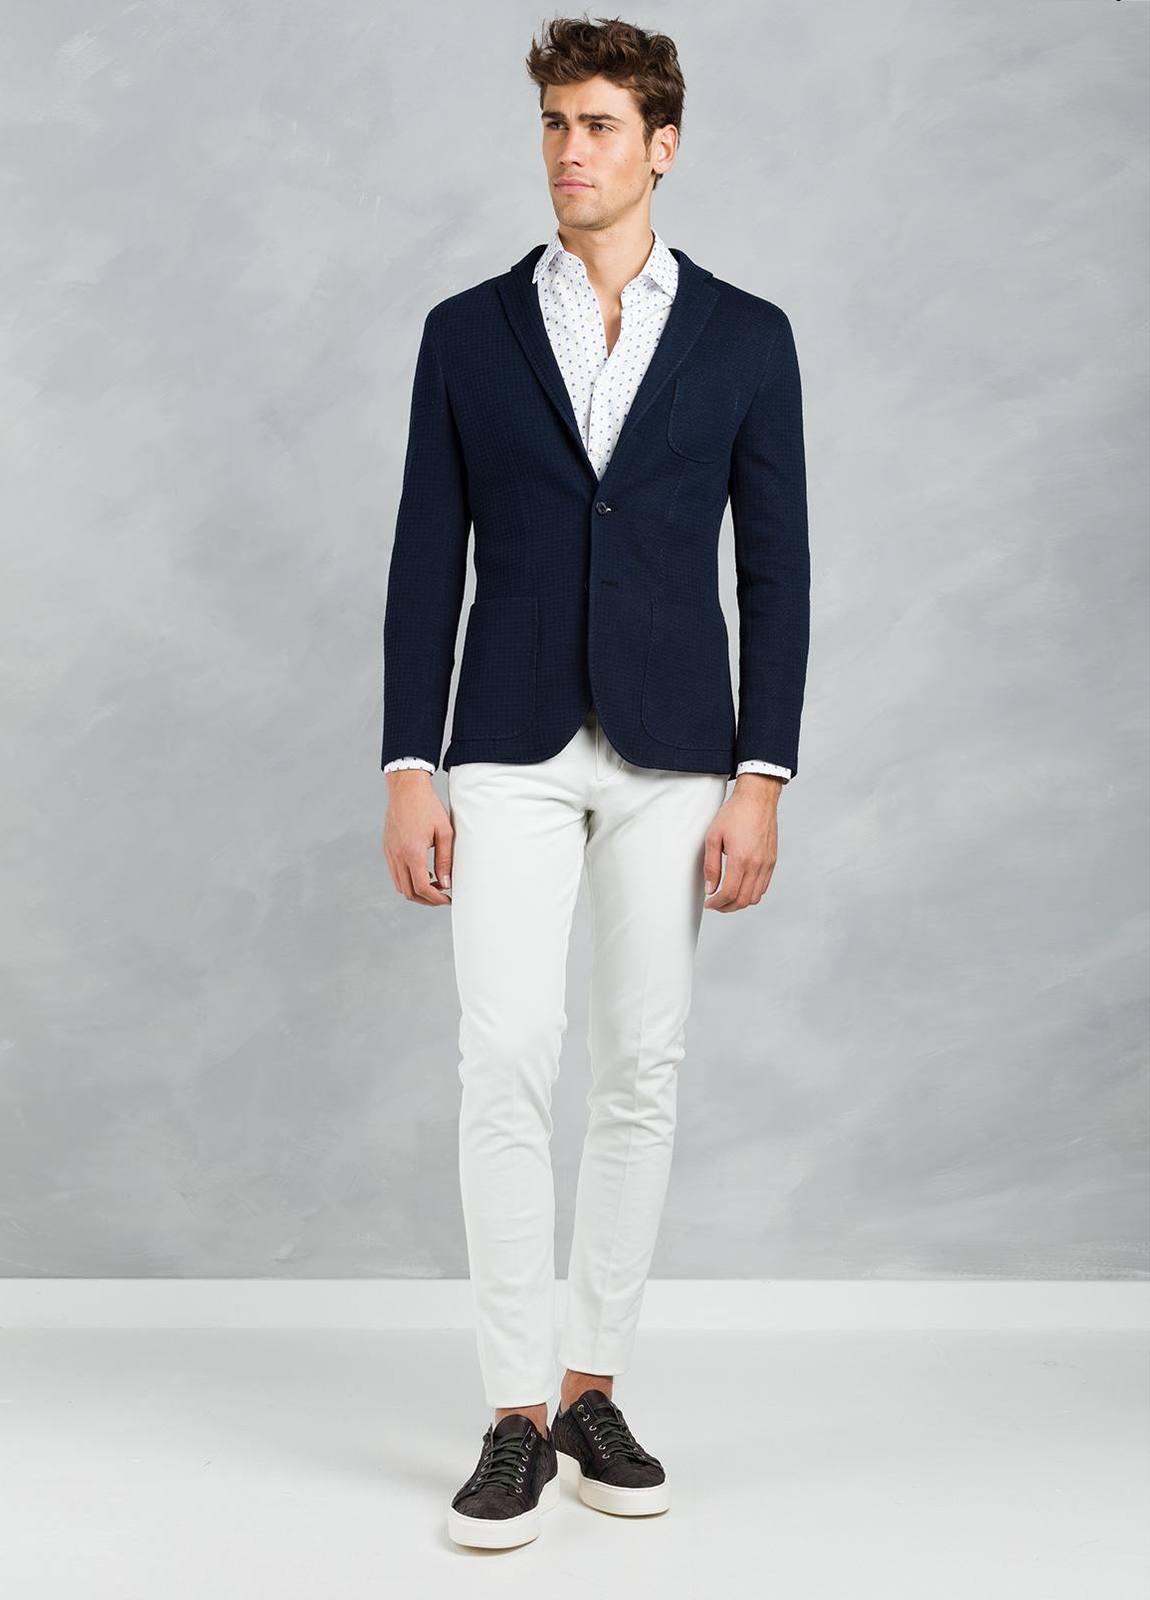 Americana SOFT JACKET Slim Fit textura color azul marino, 100% Algodón. - Ítem1